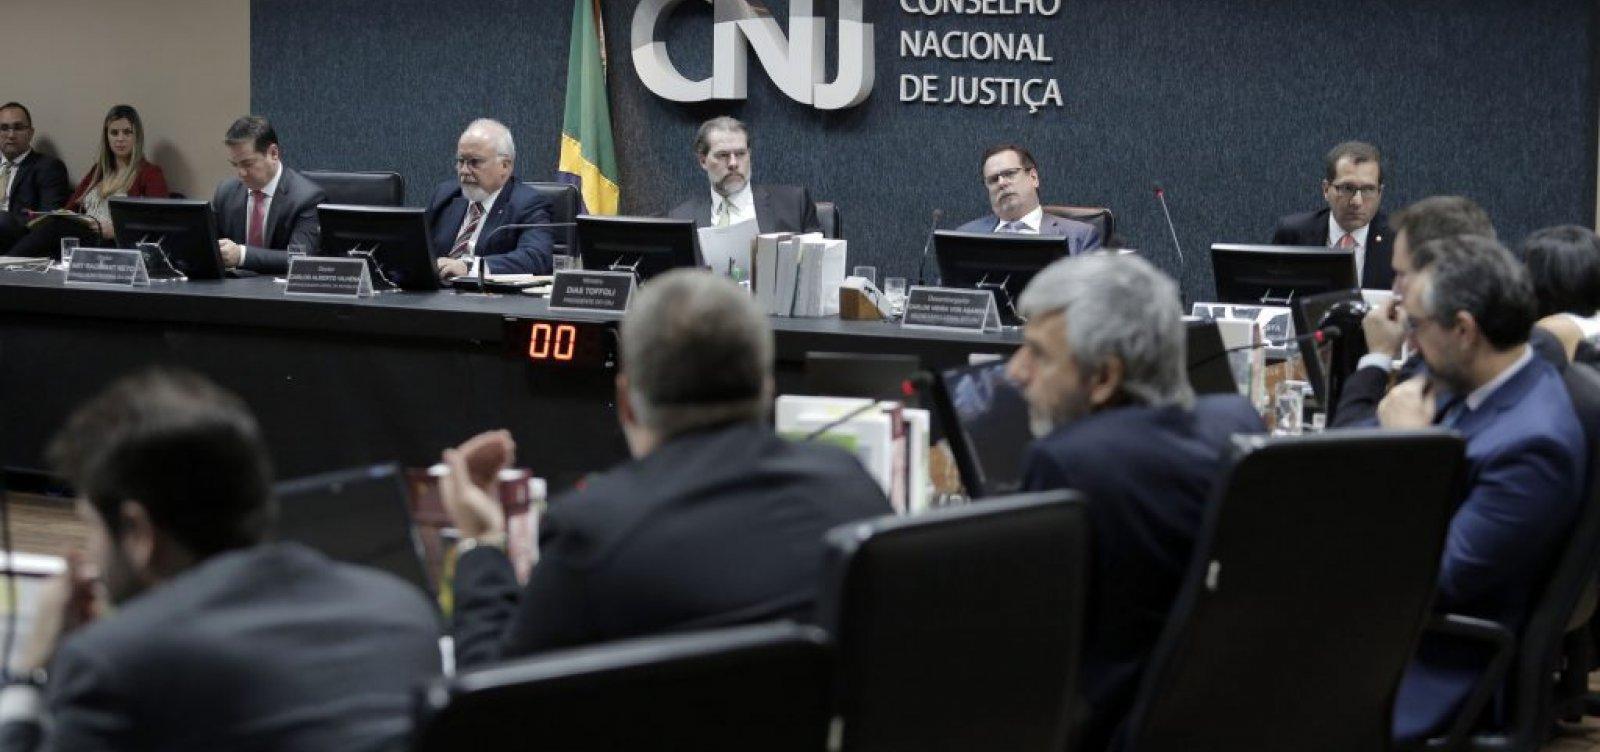 CNJ abre processo contra juiz que acusou Gilmar Mendes de receber propina